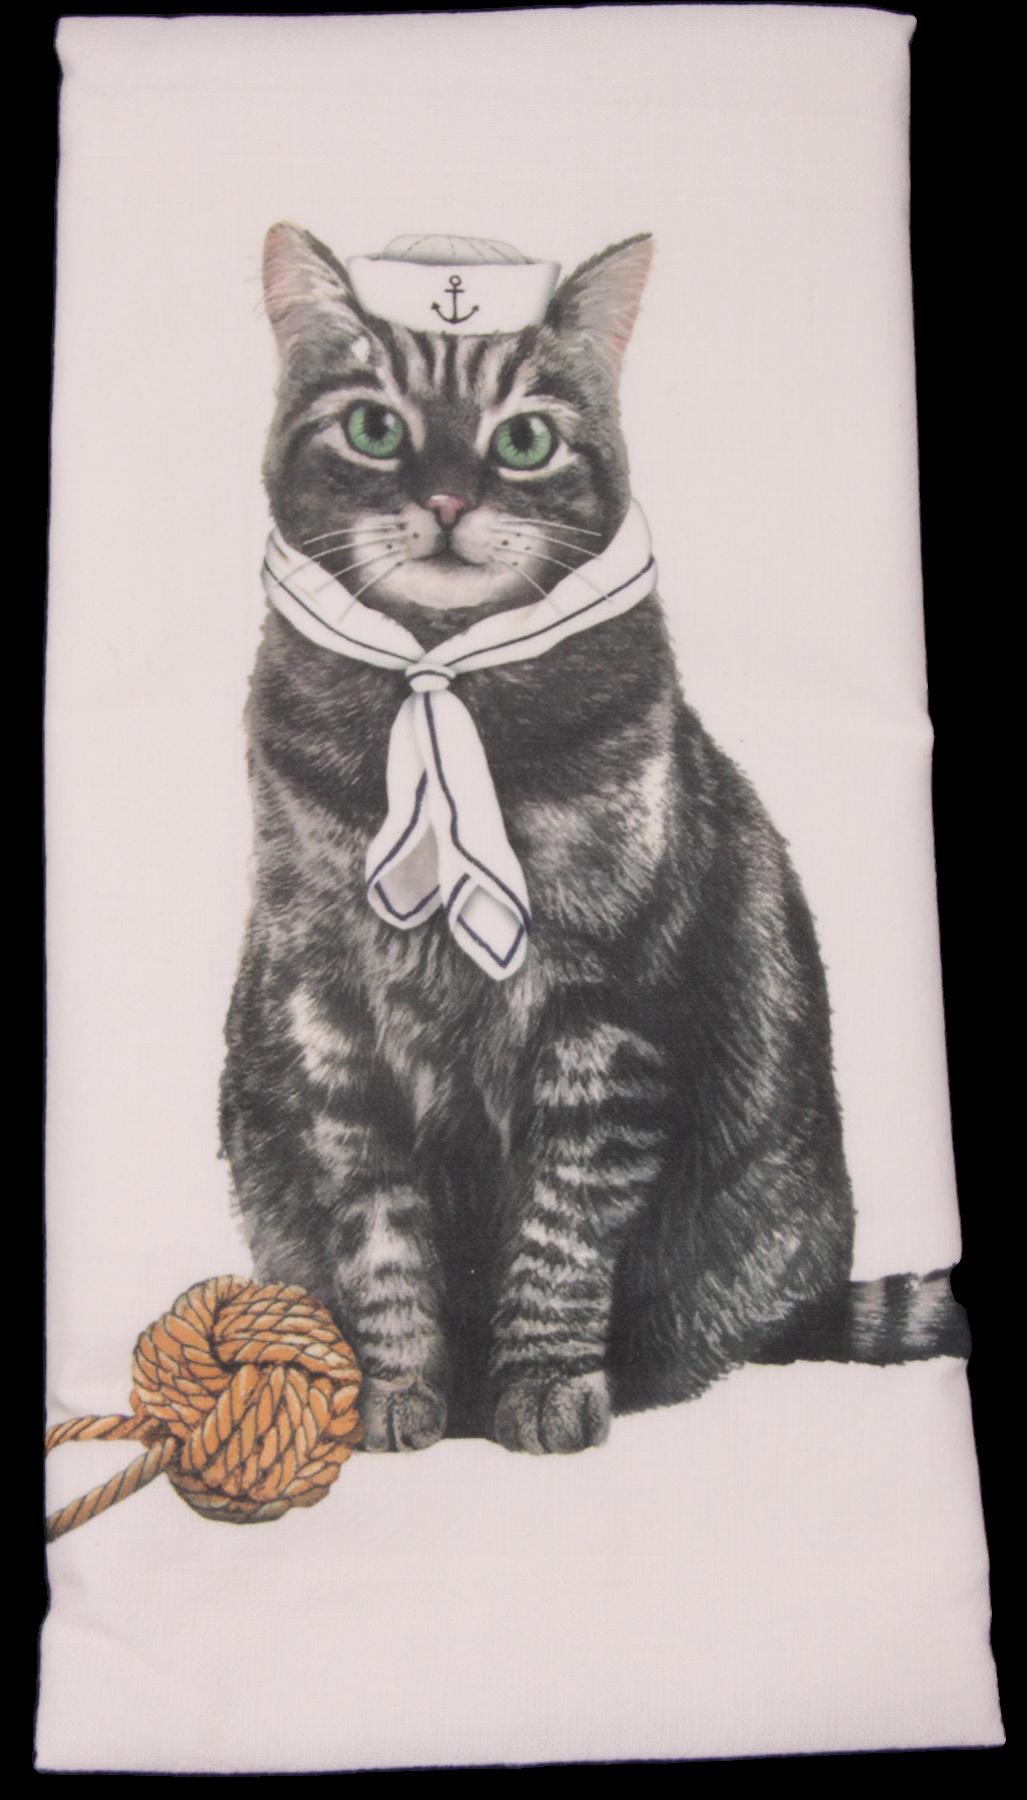 Sailor Gray Tabby Cat Printed Flour Sack Dish Towel